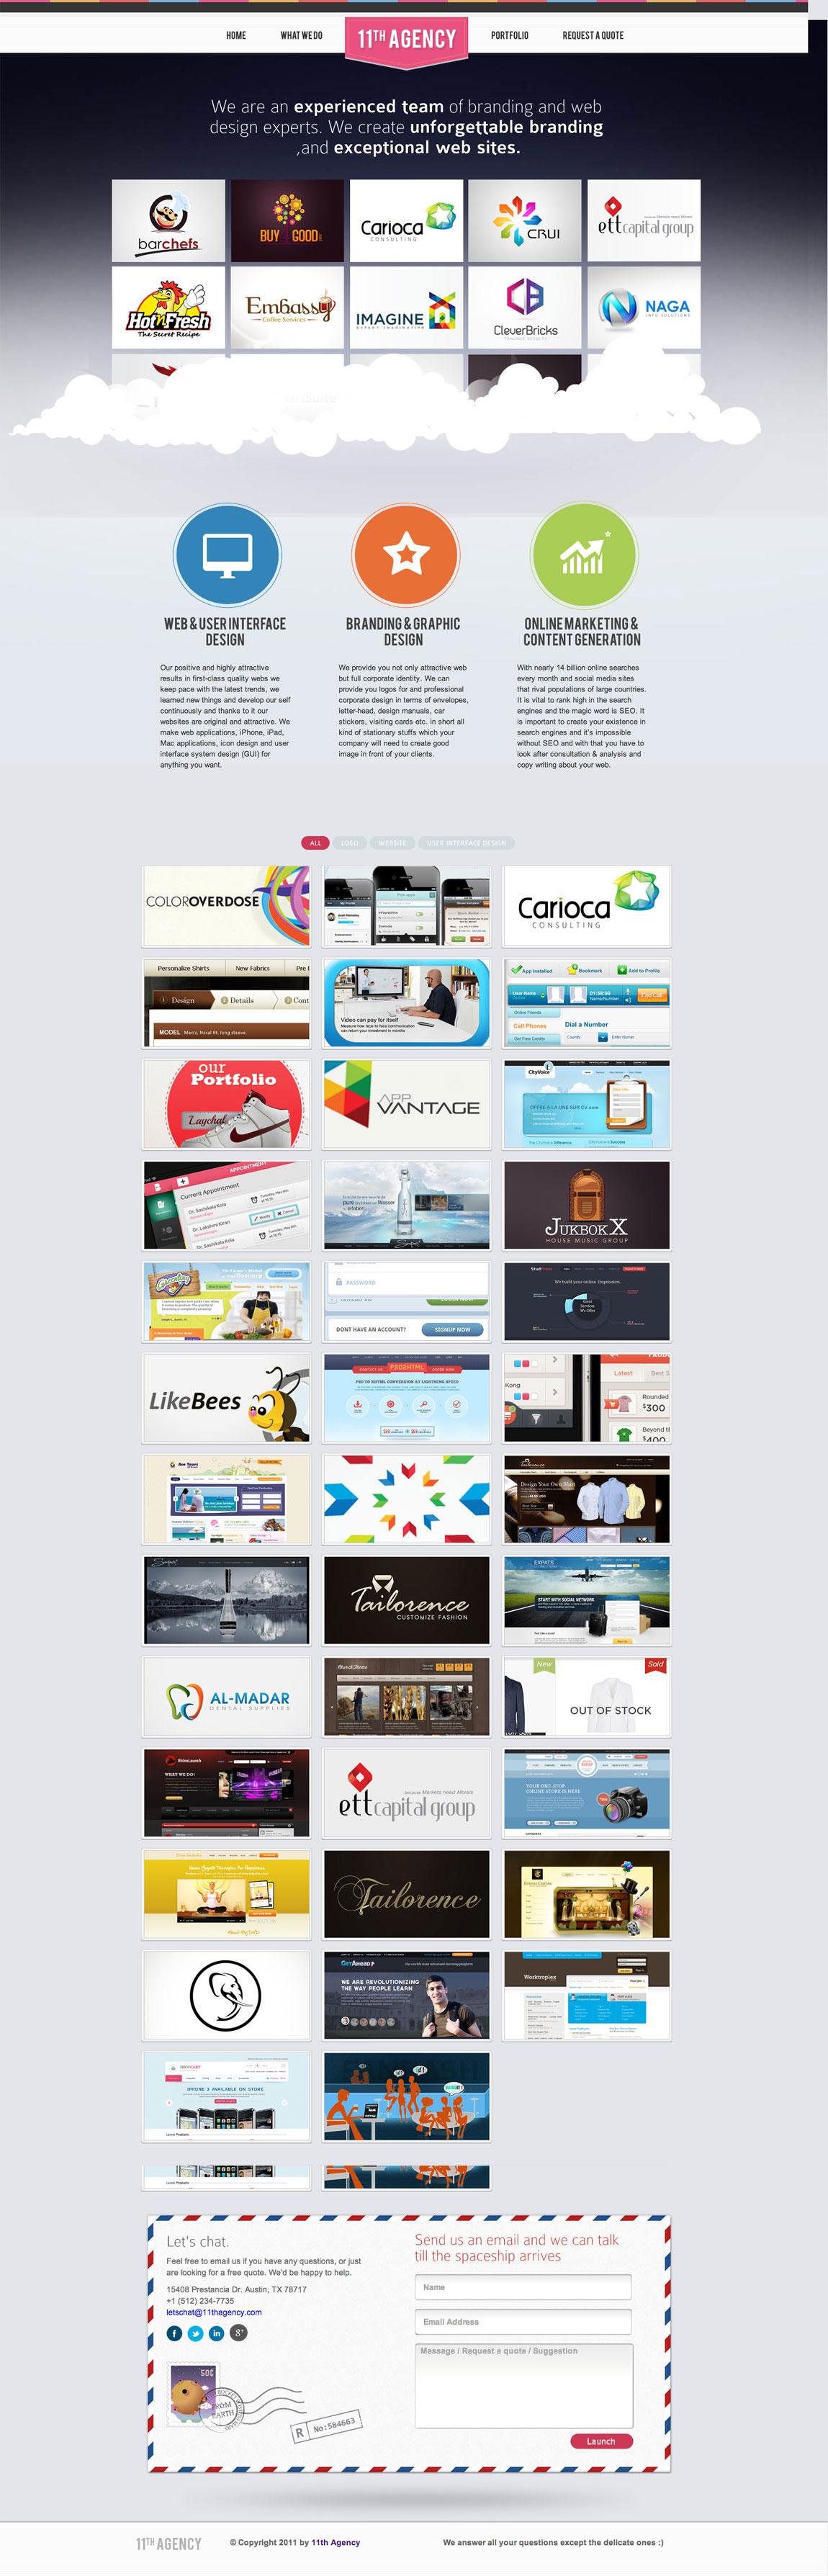 11th Agency Website Screenshot